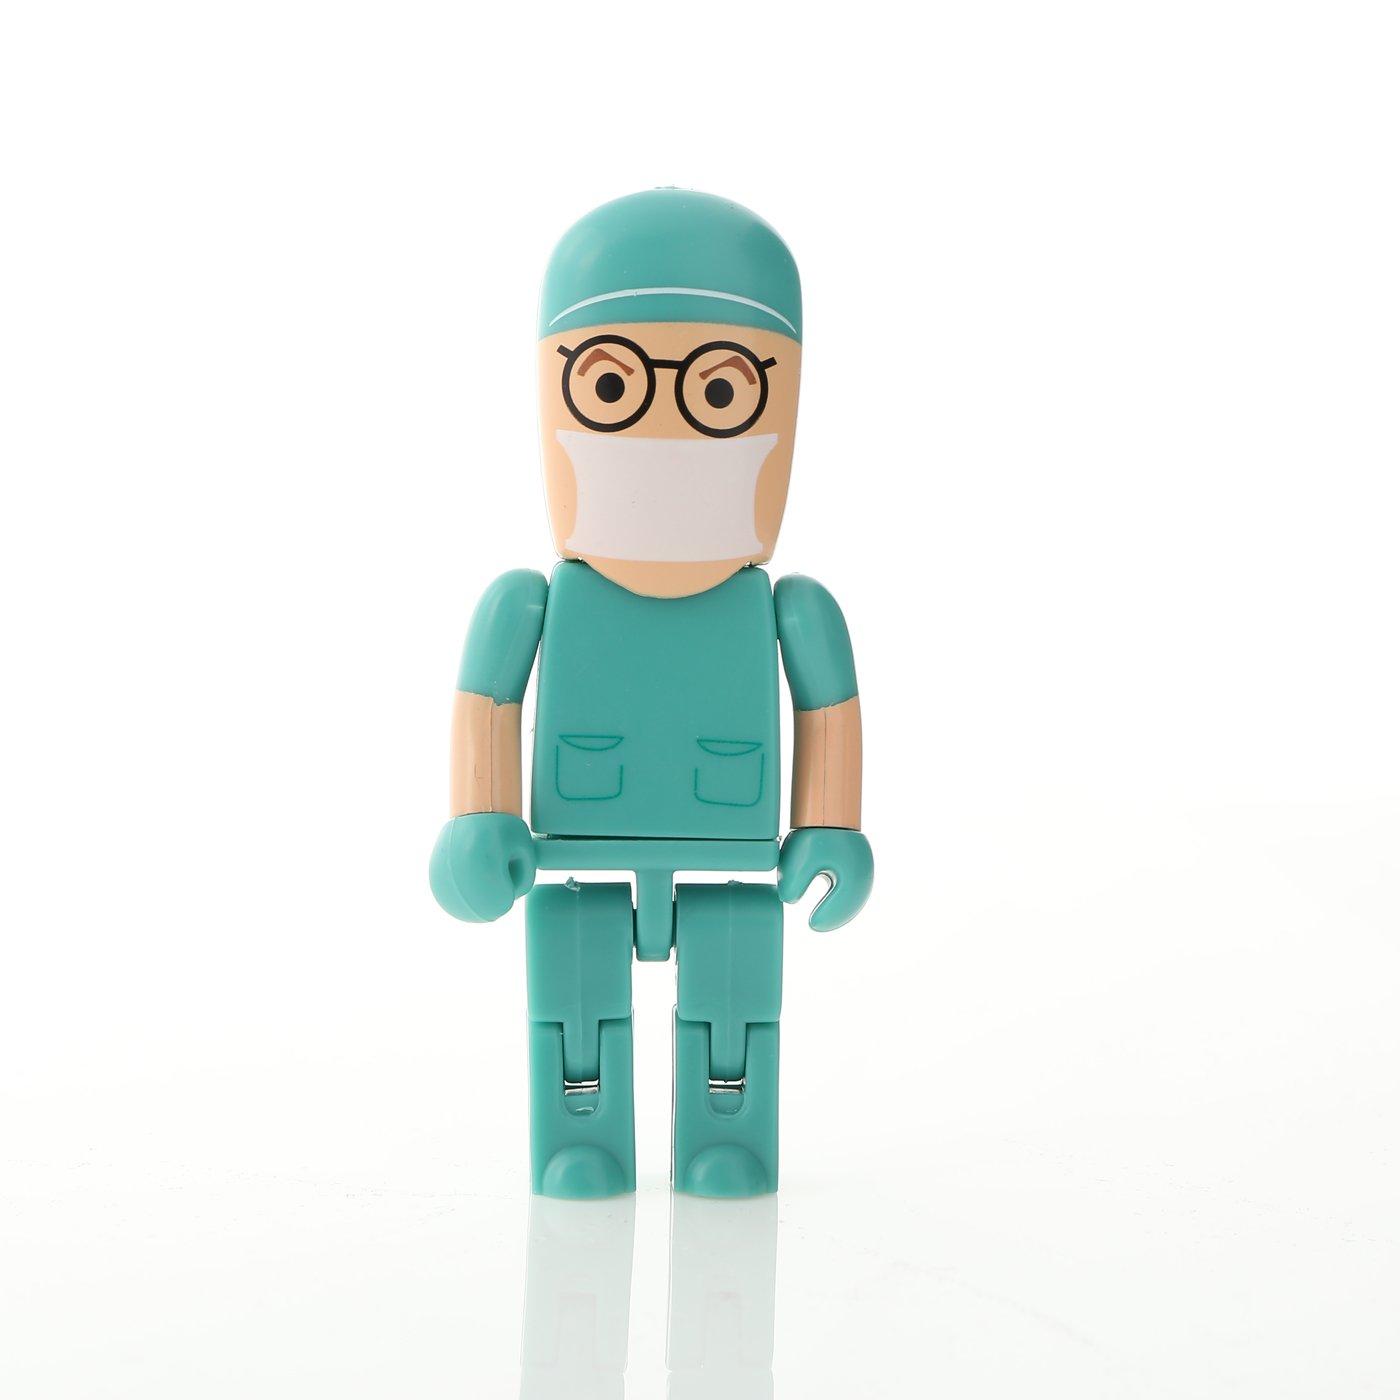 Surgeon USB Flash Drive